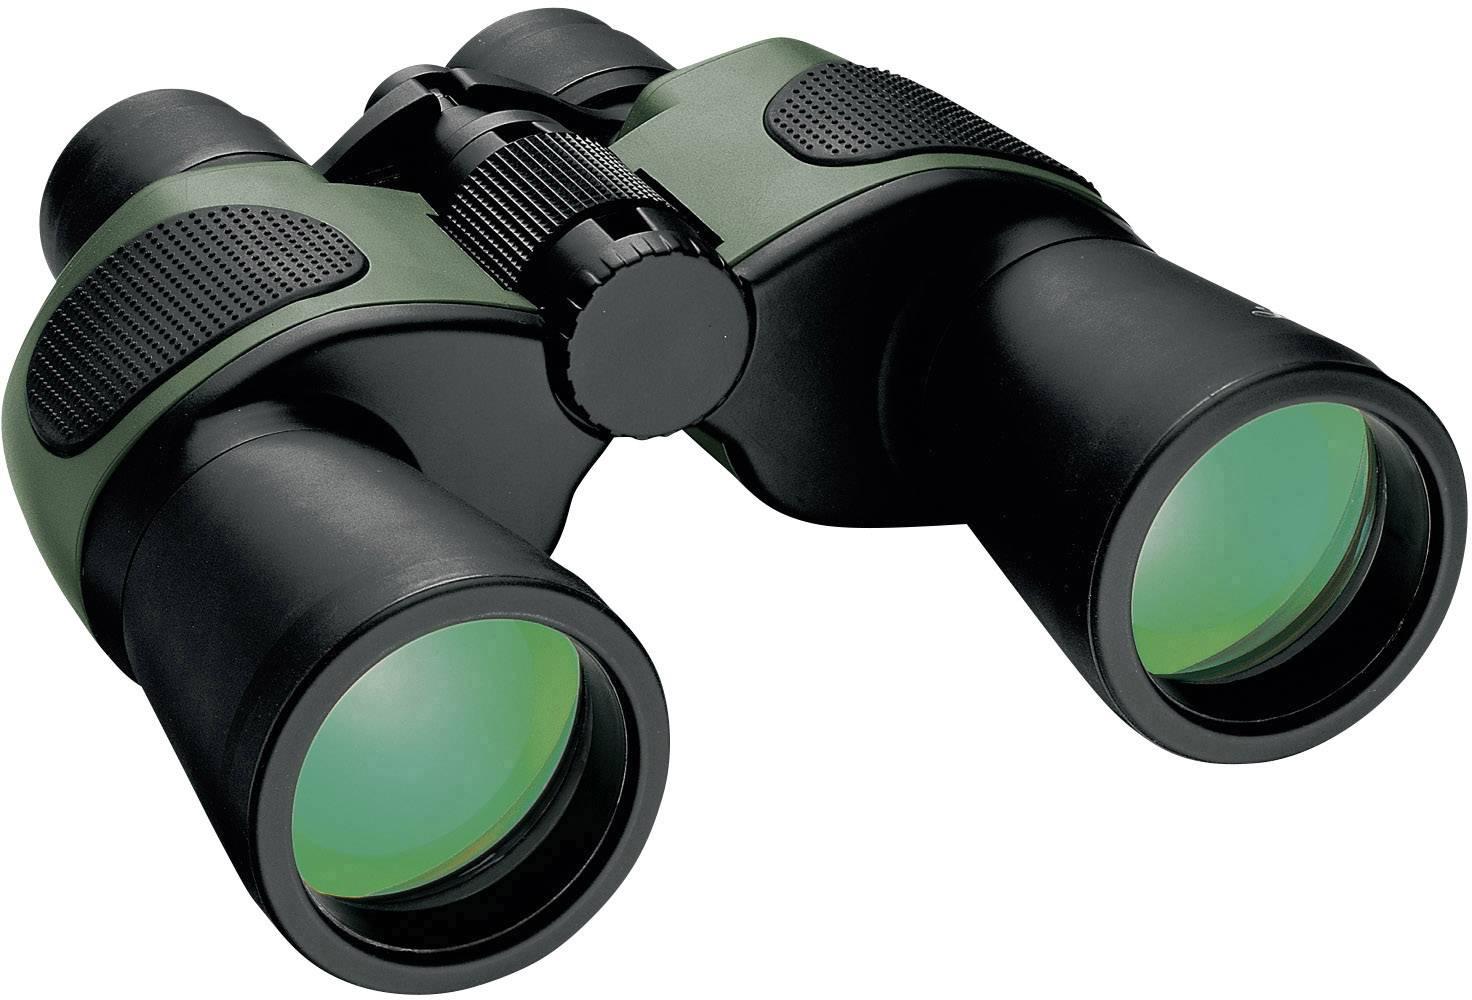 Luger ZV Binocolo zoom 10 - 30